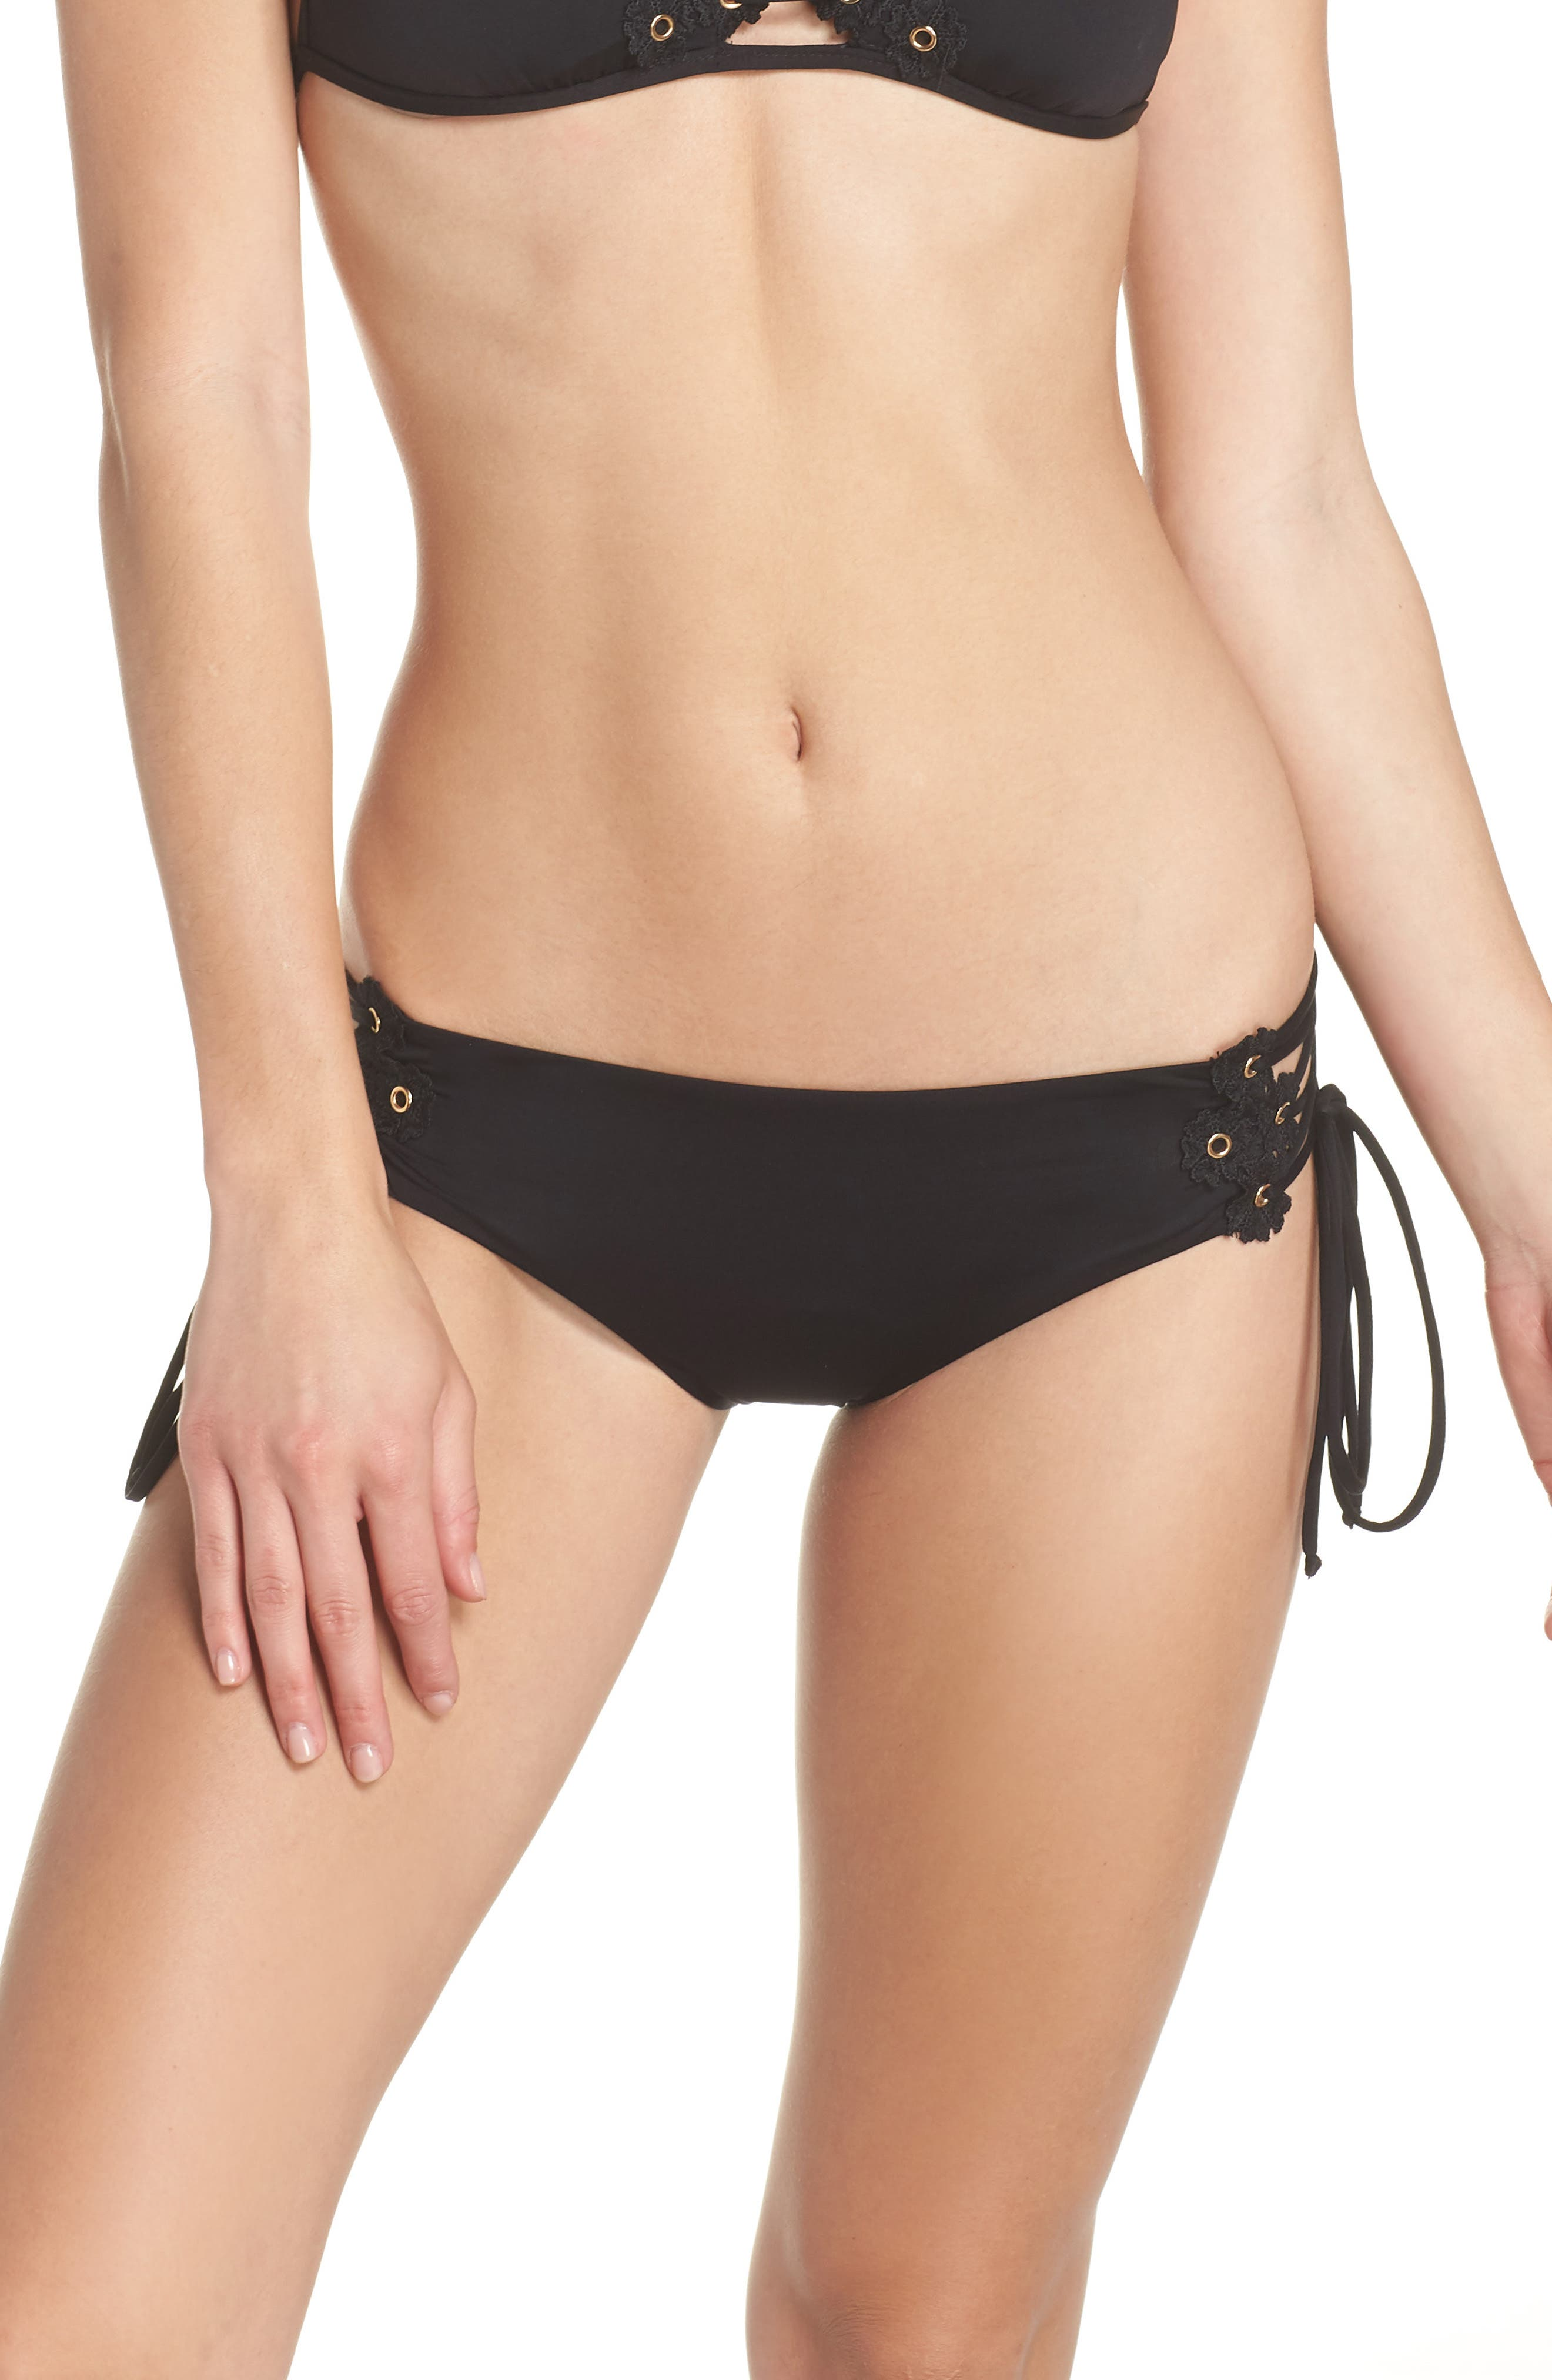 Set Sail Lace-Up Bikini Bottoms,                         Main,                         color, BLACK